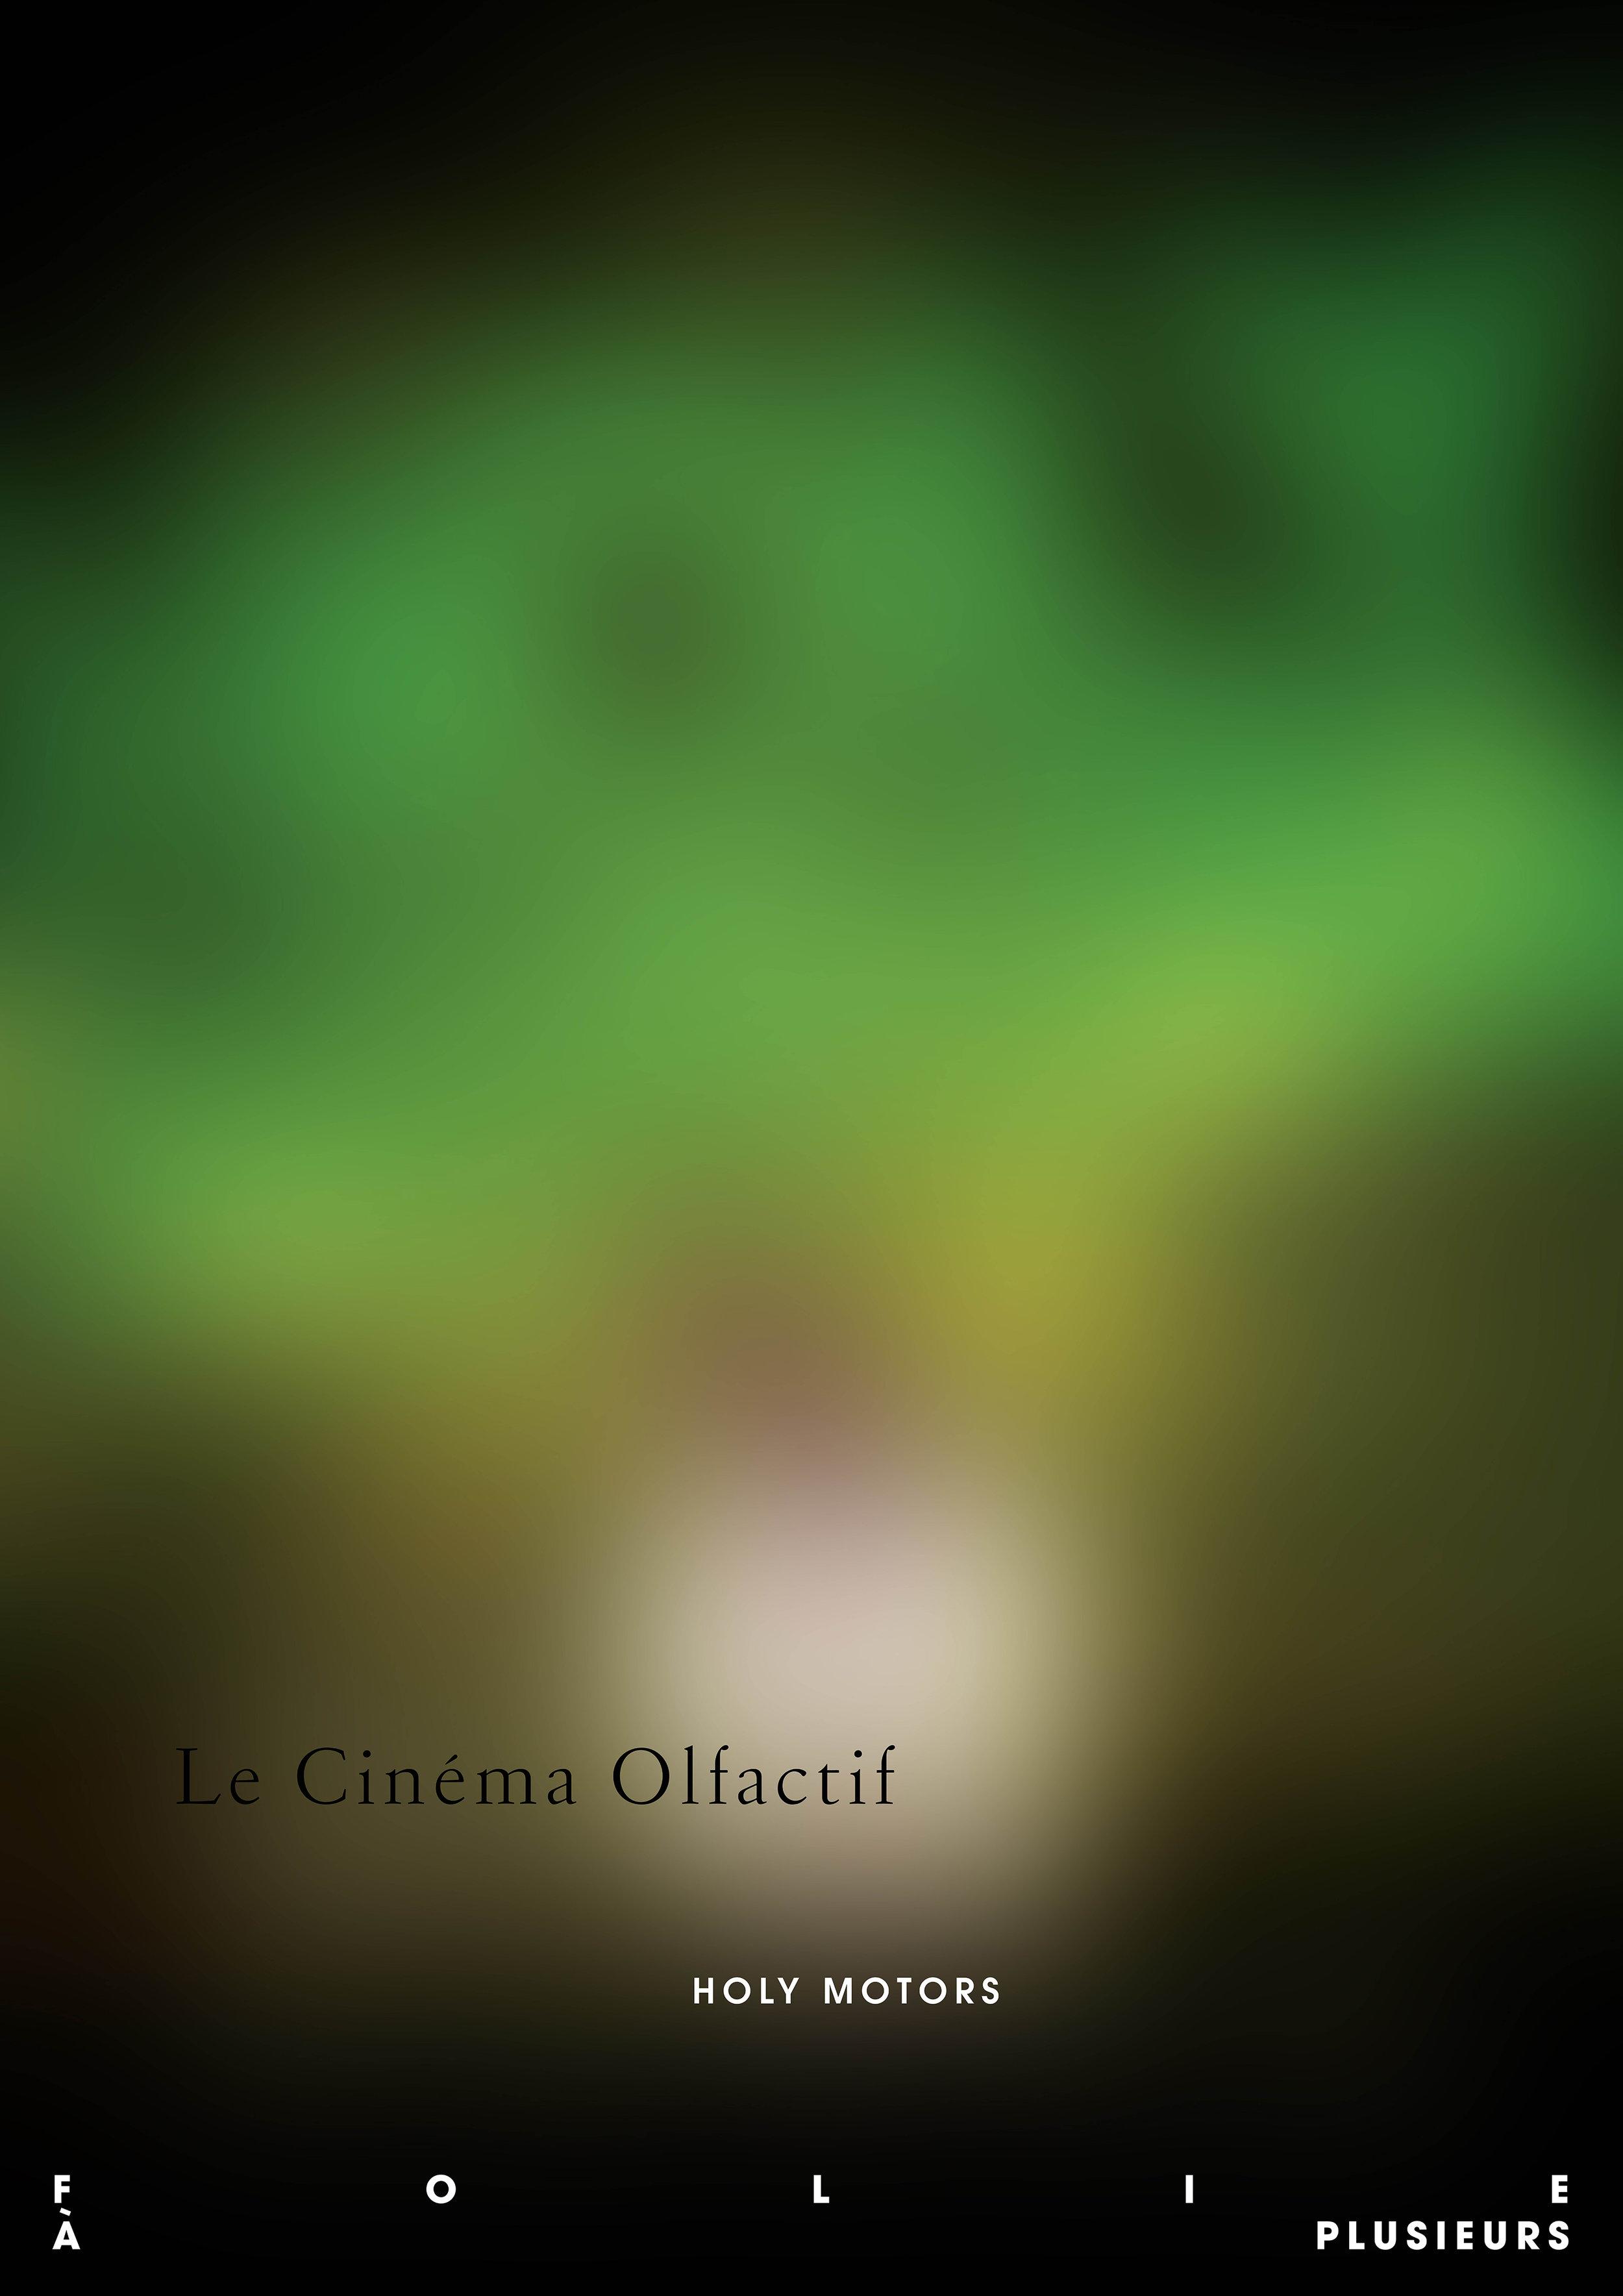 holy_motors-Perfume-Folie-A-Plusieurs